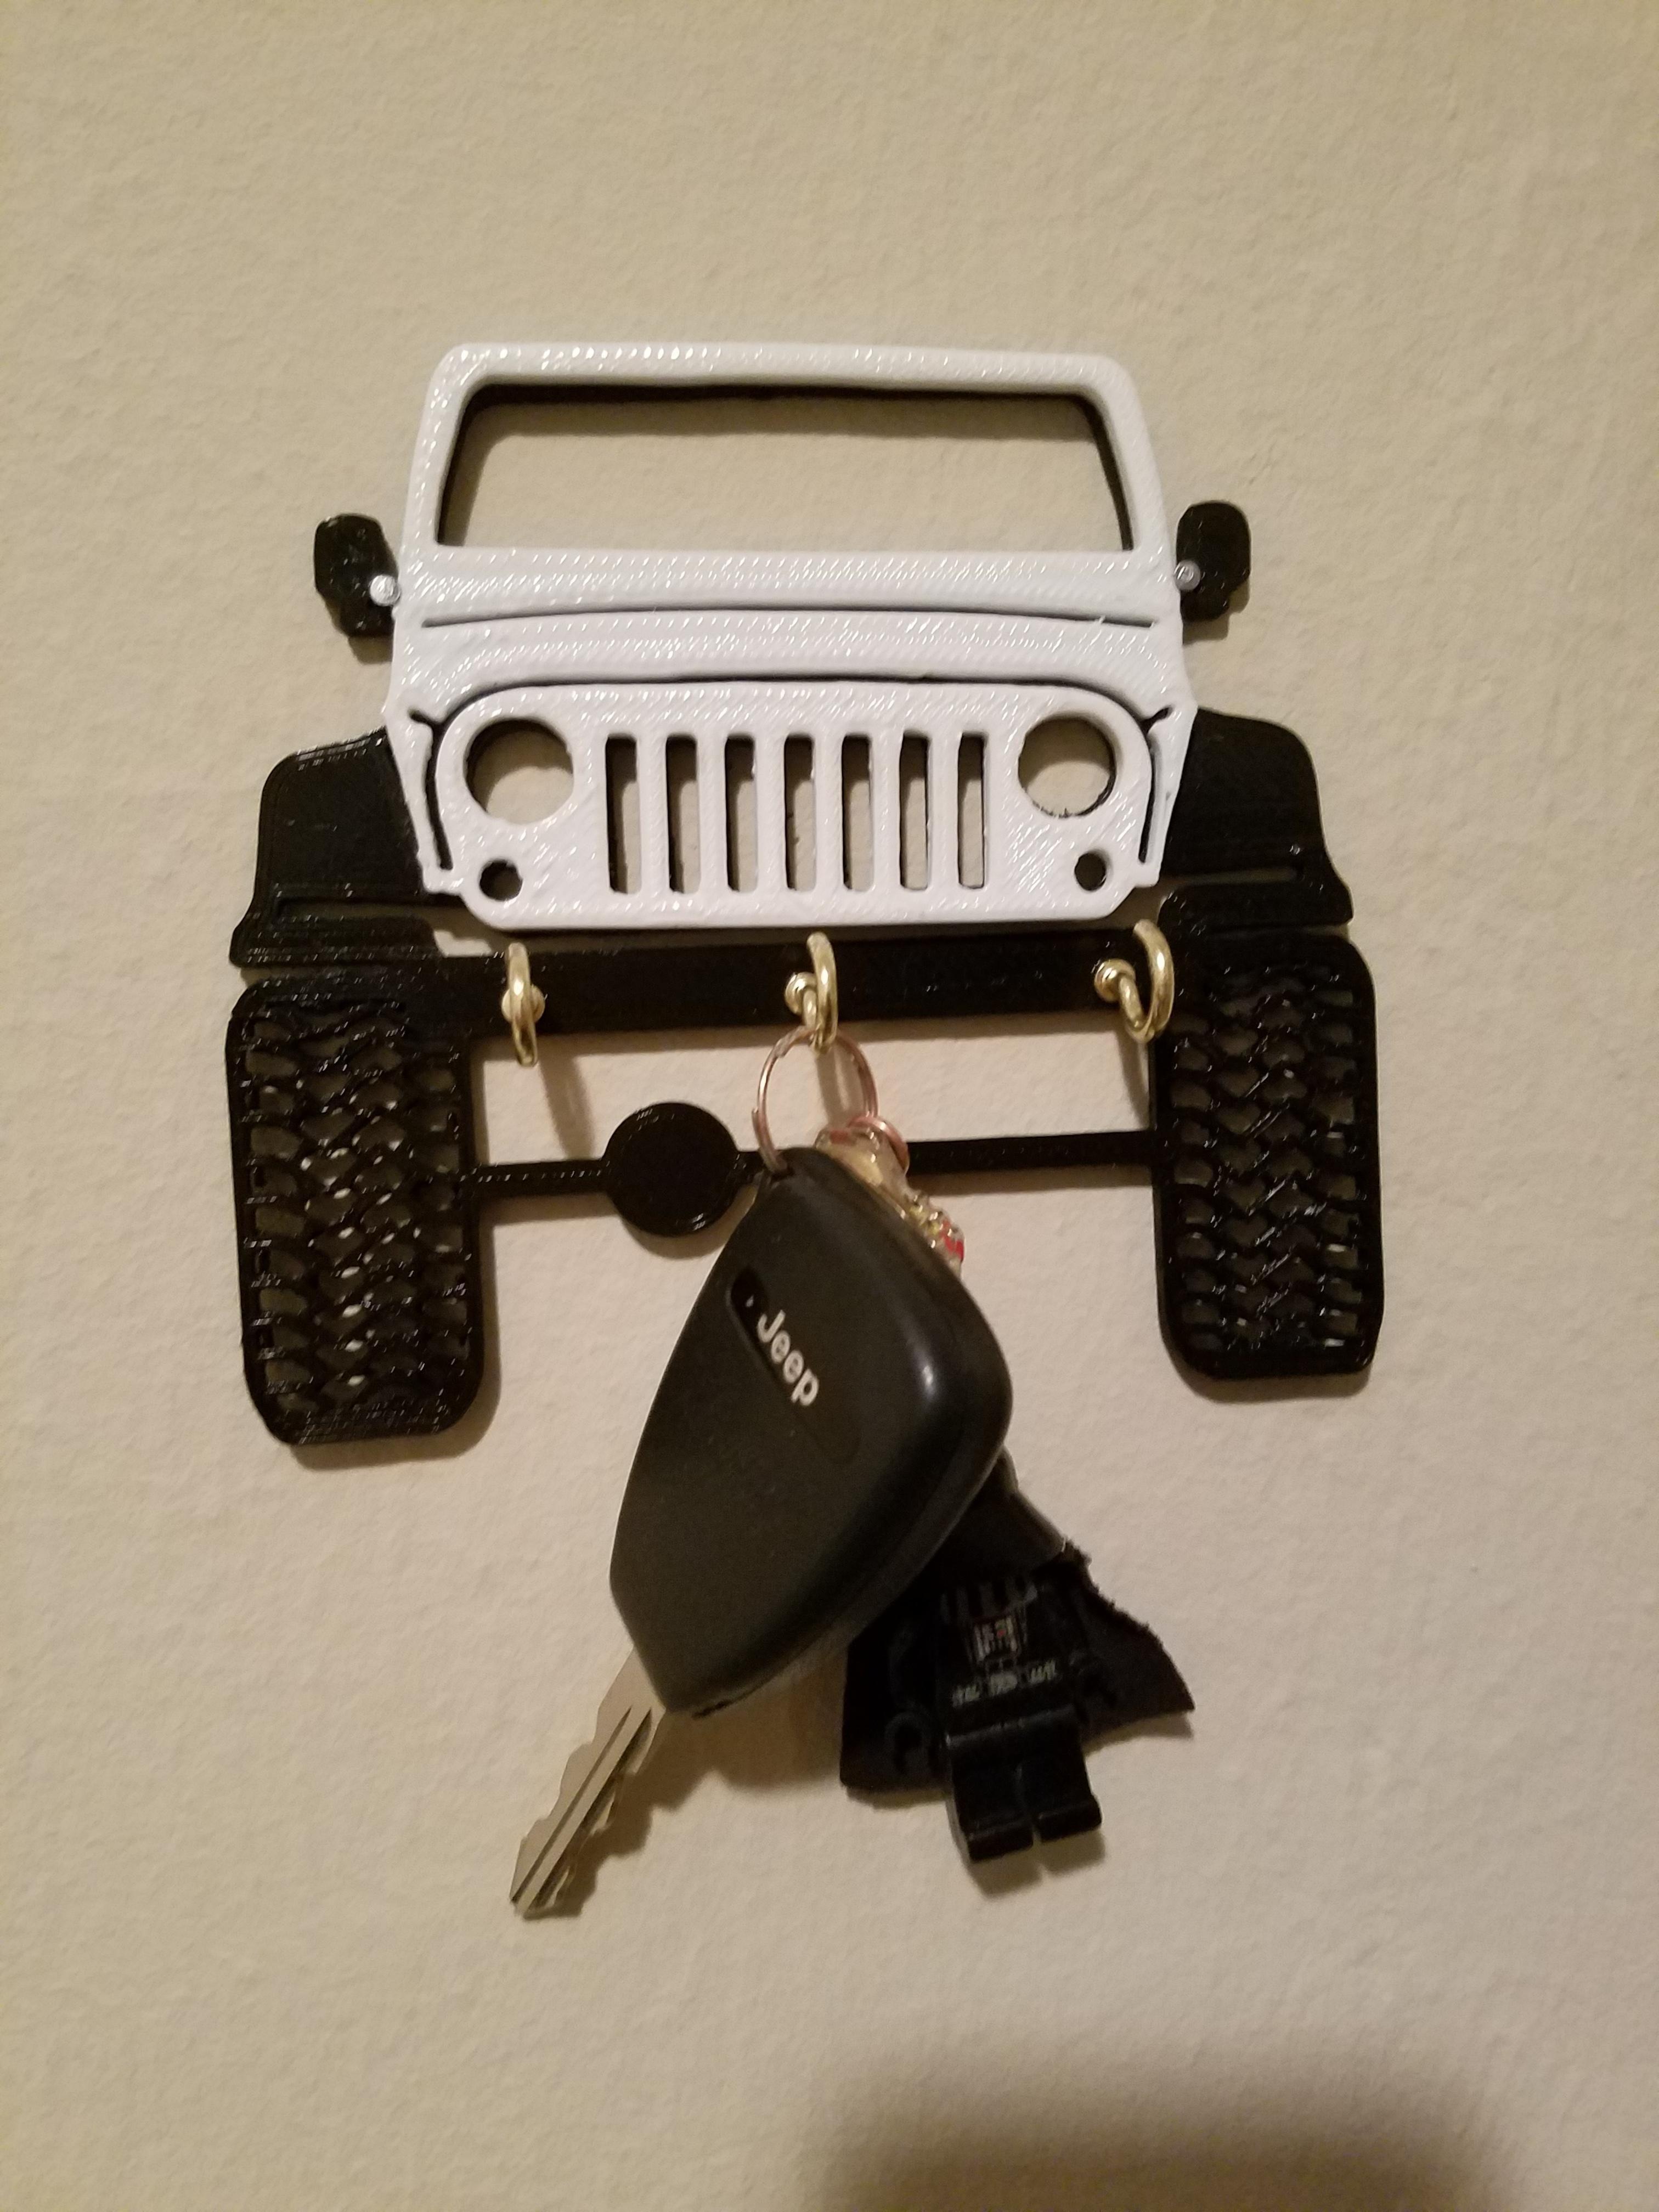 3d Printed Jeep Key Holder Jeep Jeeplife Wrangler Jeeps